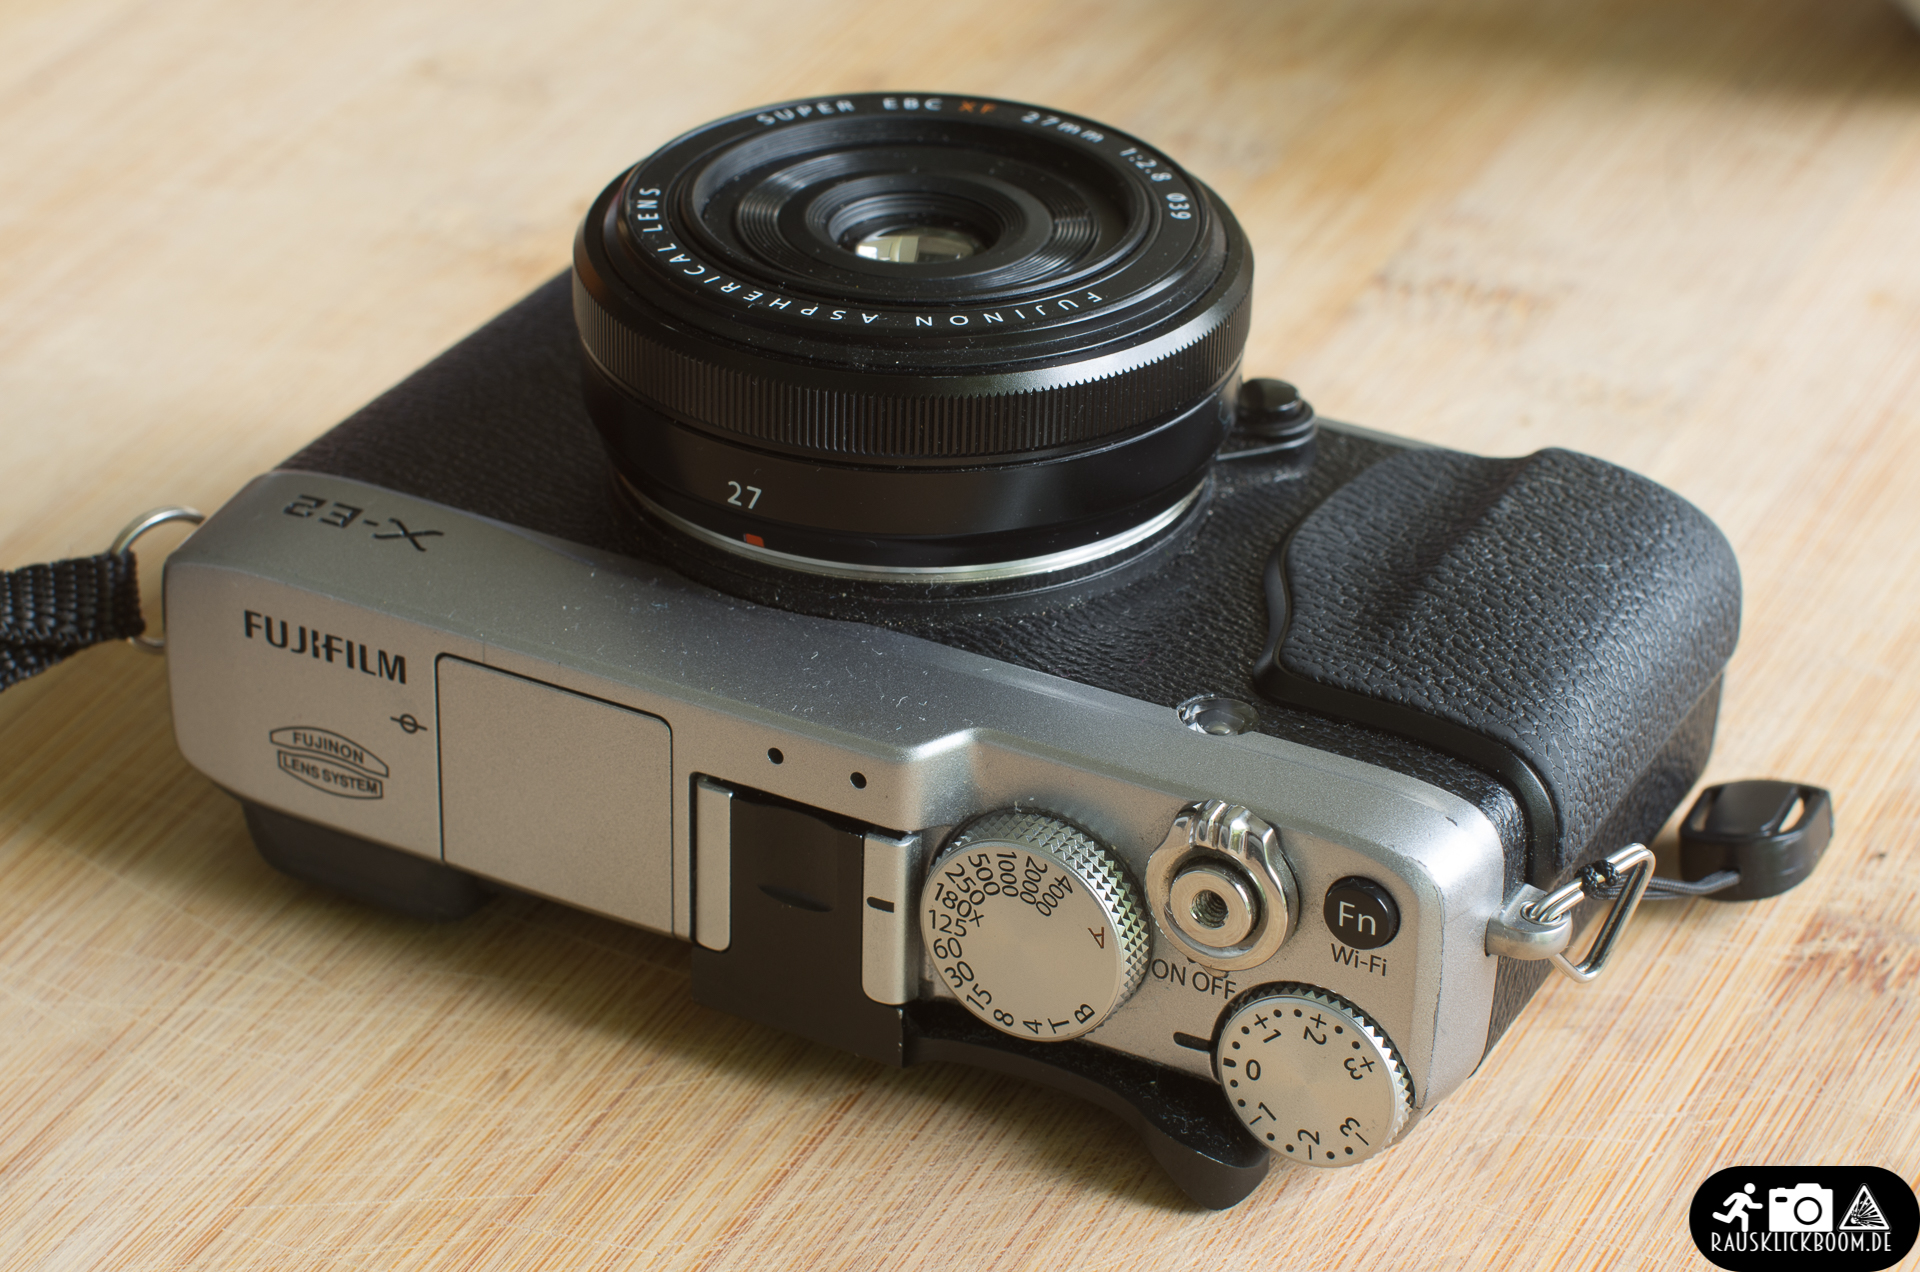 Fujinon XF27mm F2.8 an der Fujifilm X-E2 - Test, Review, Hands-On